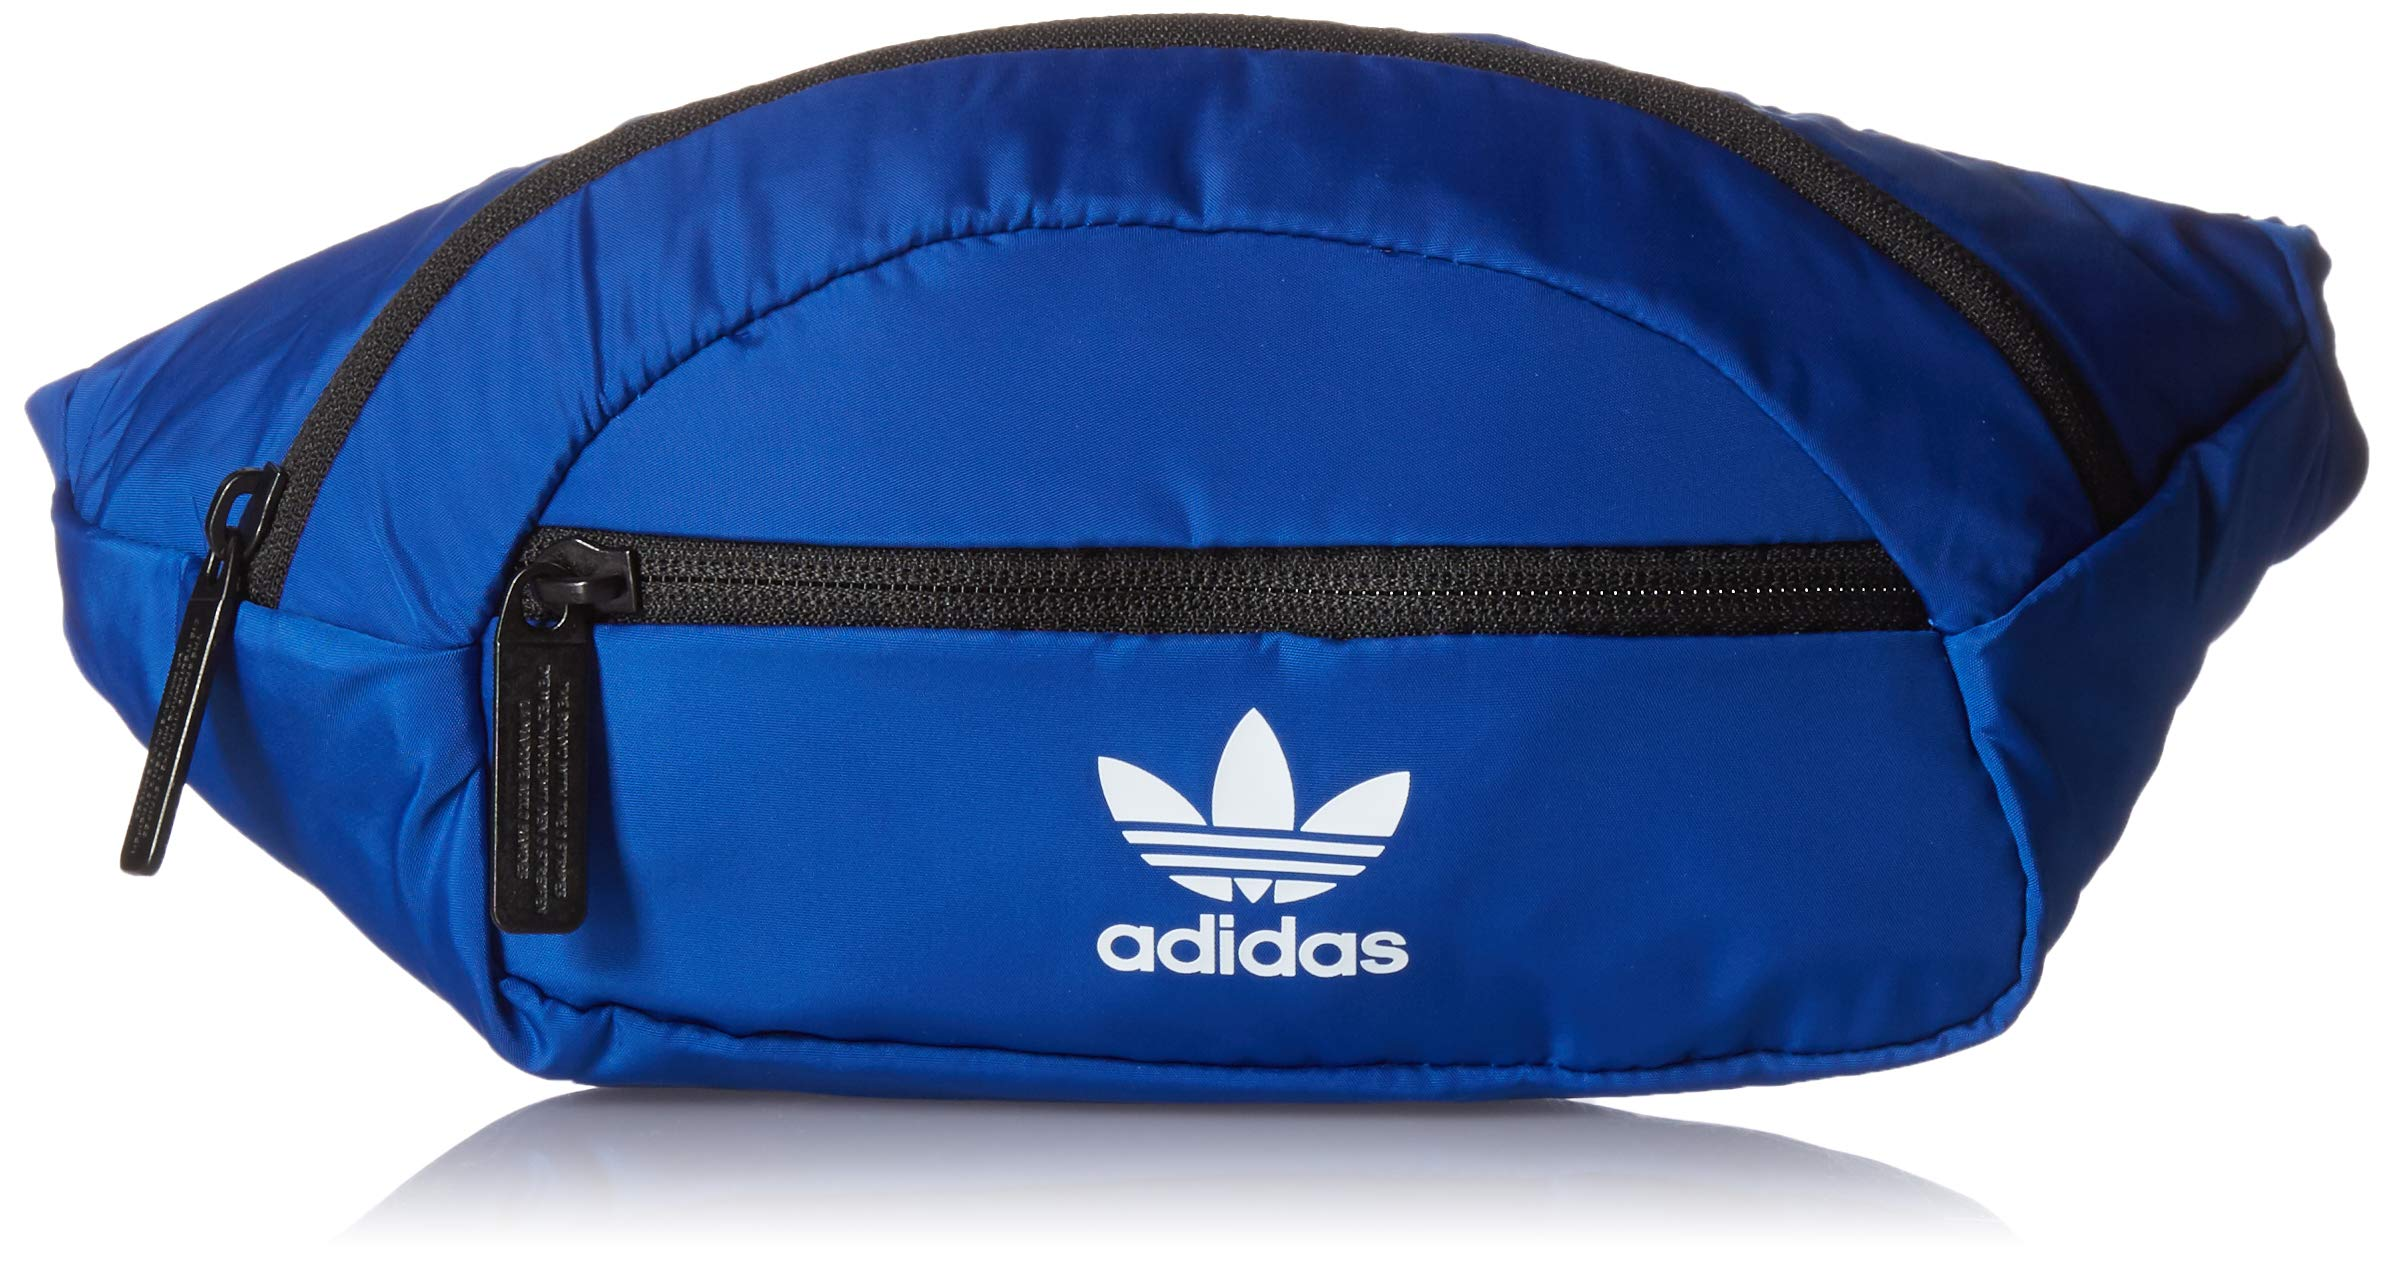 adidas Originals Unisex National Waist Pack, Collegiate Royal Blue, ONE SIZE by adidas Originals